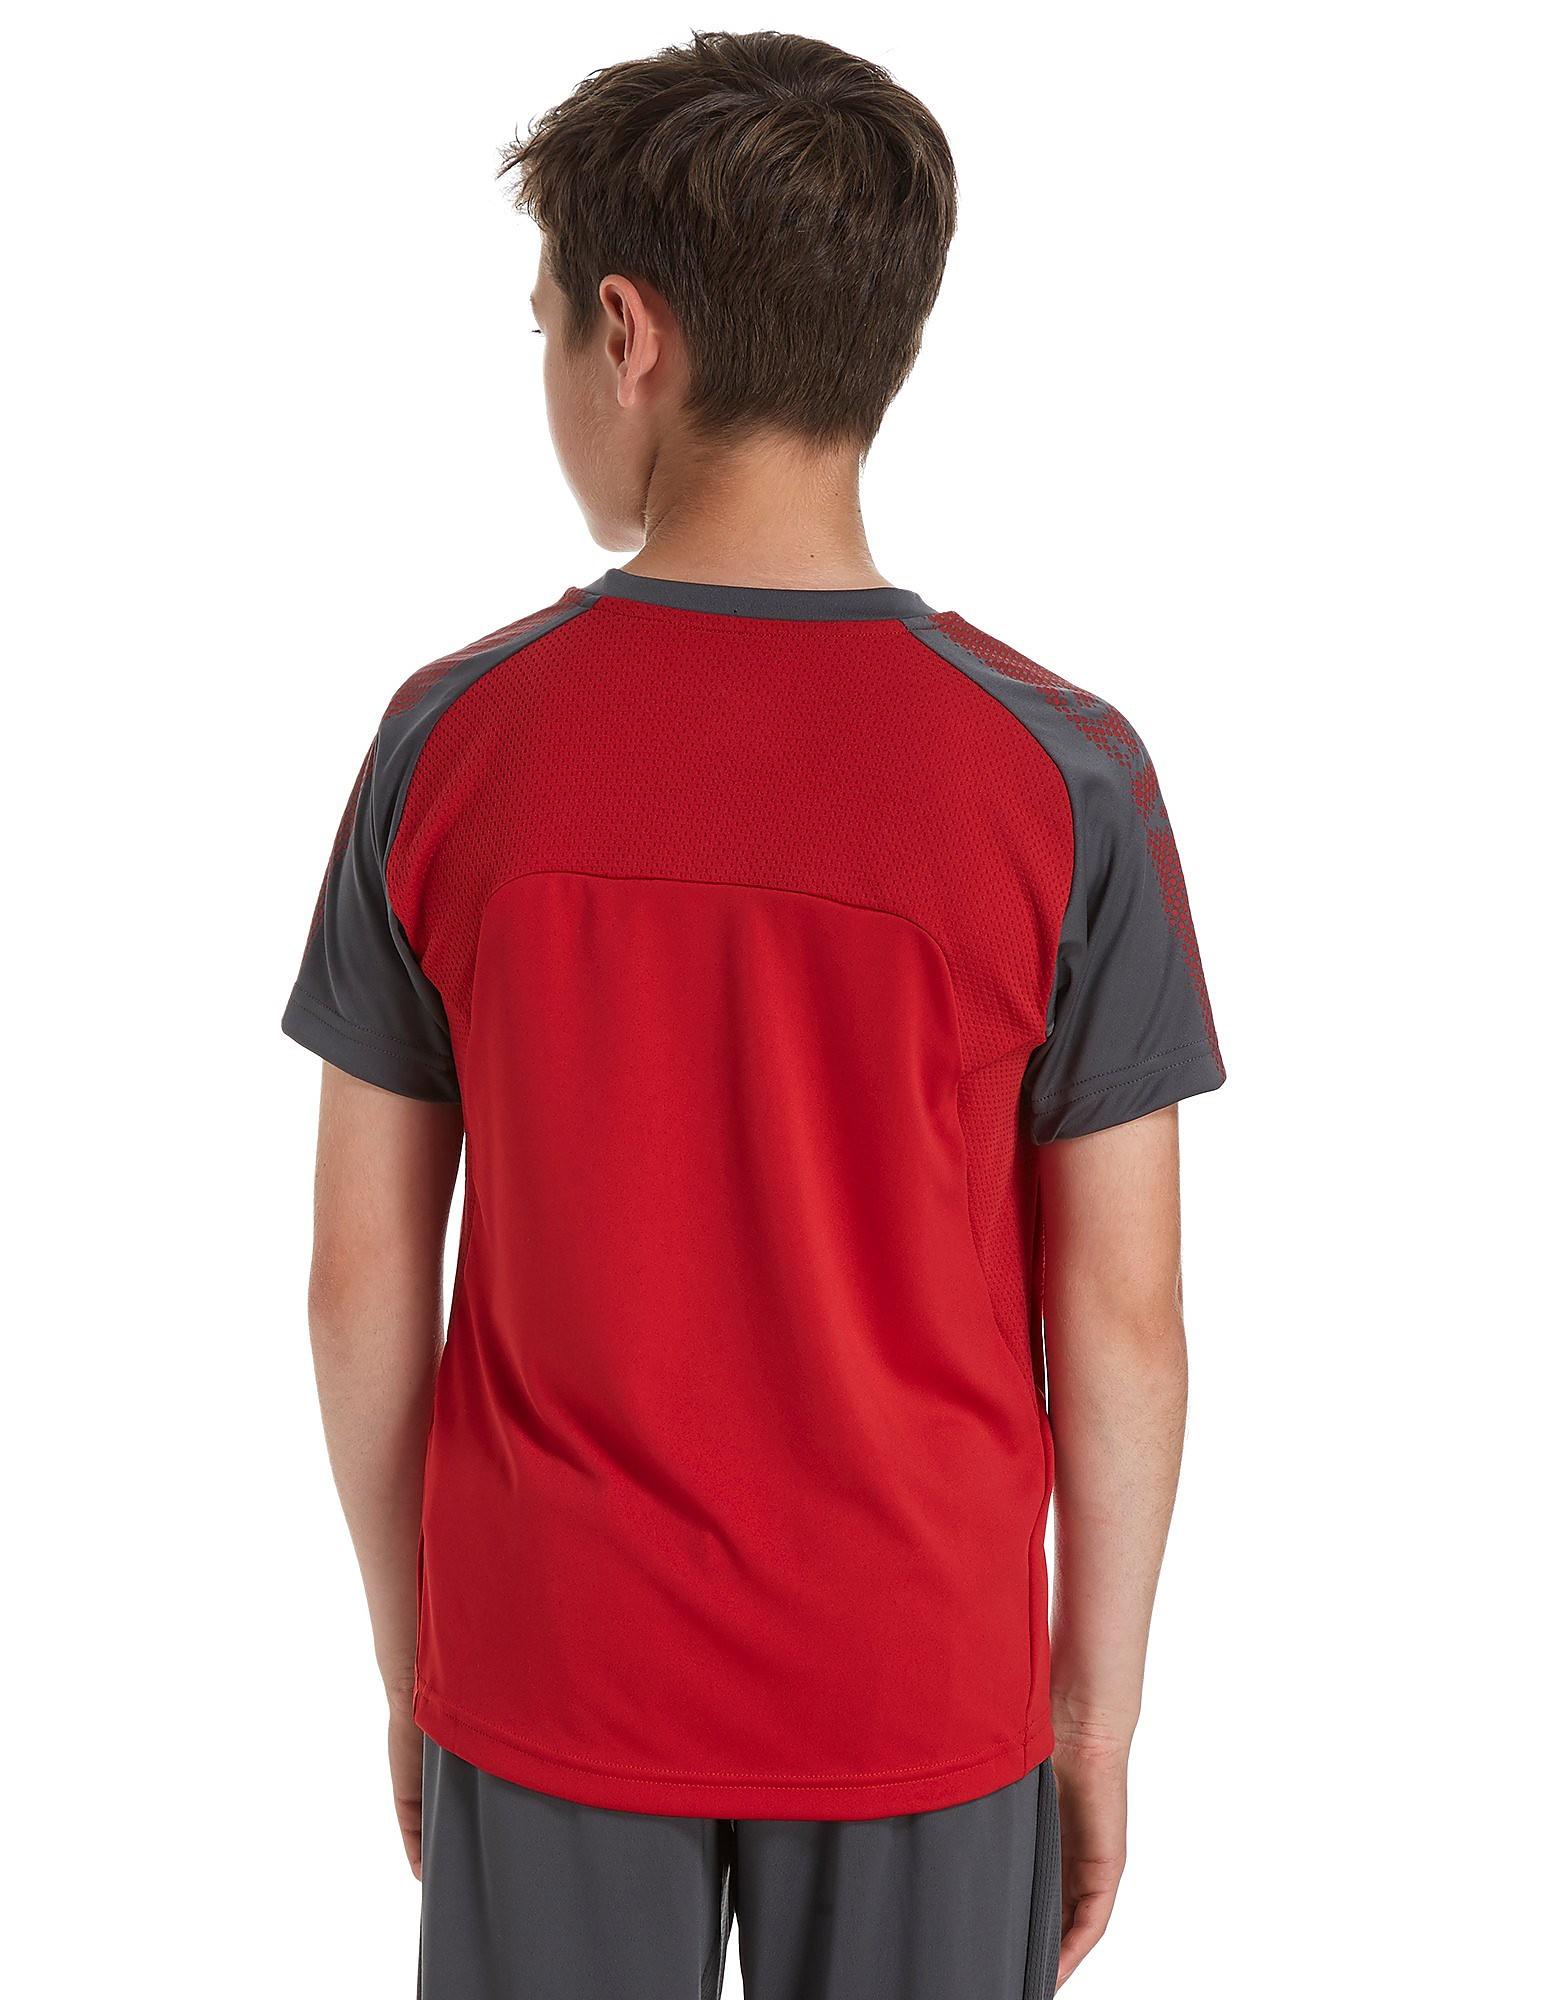 PUMA Arsenal 2017 Training Shirt Junior